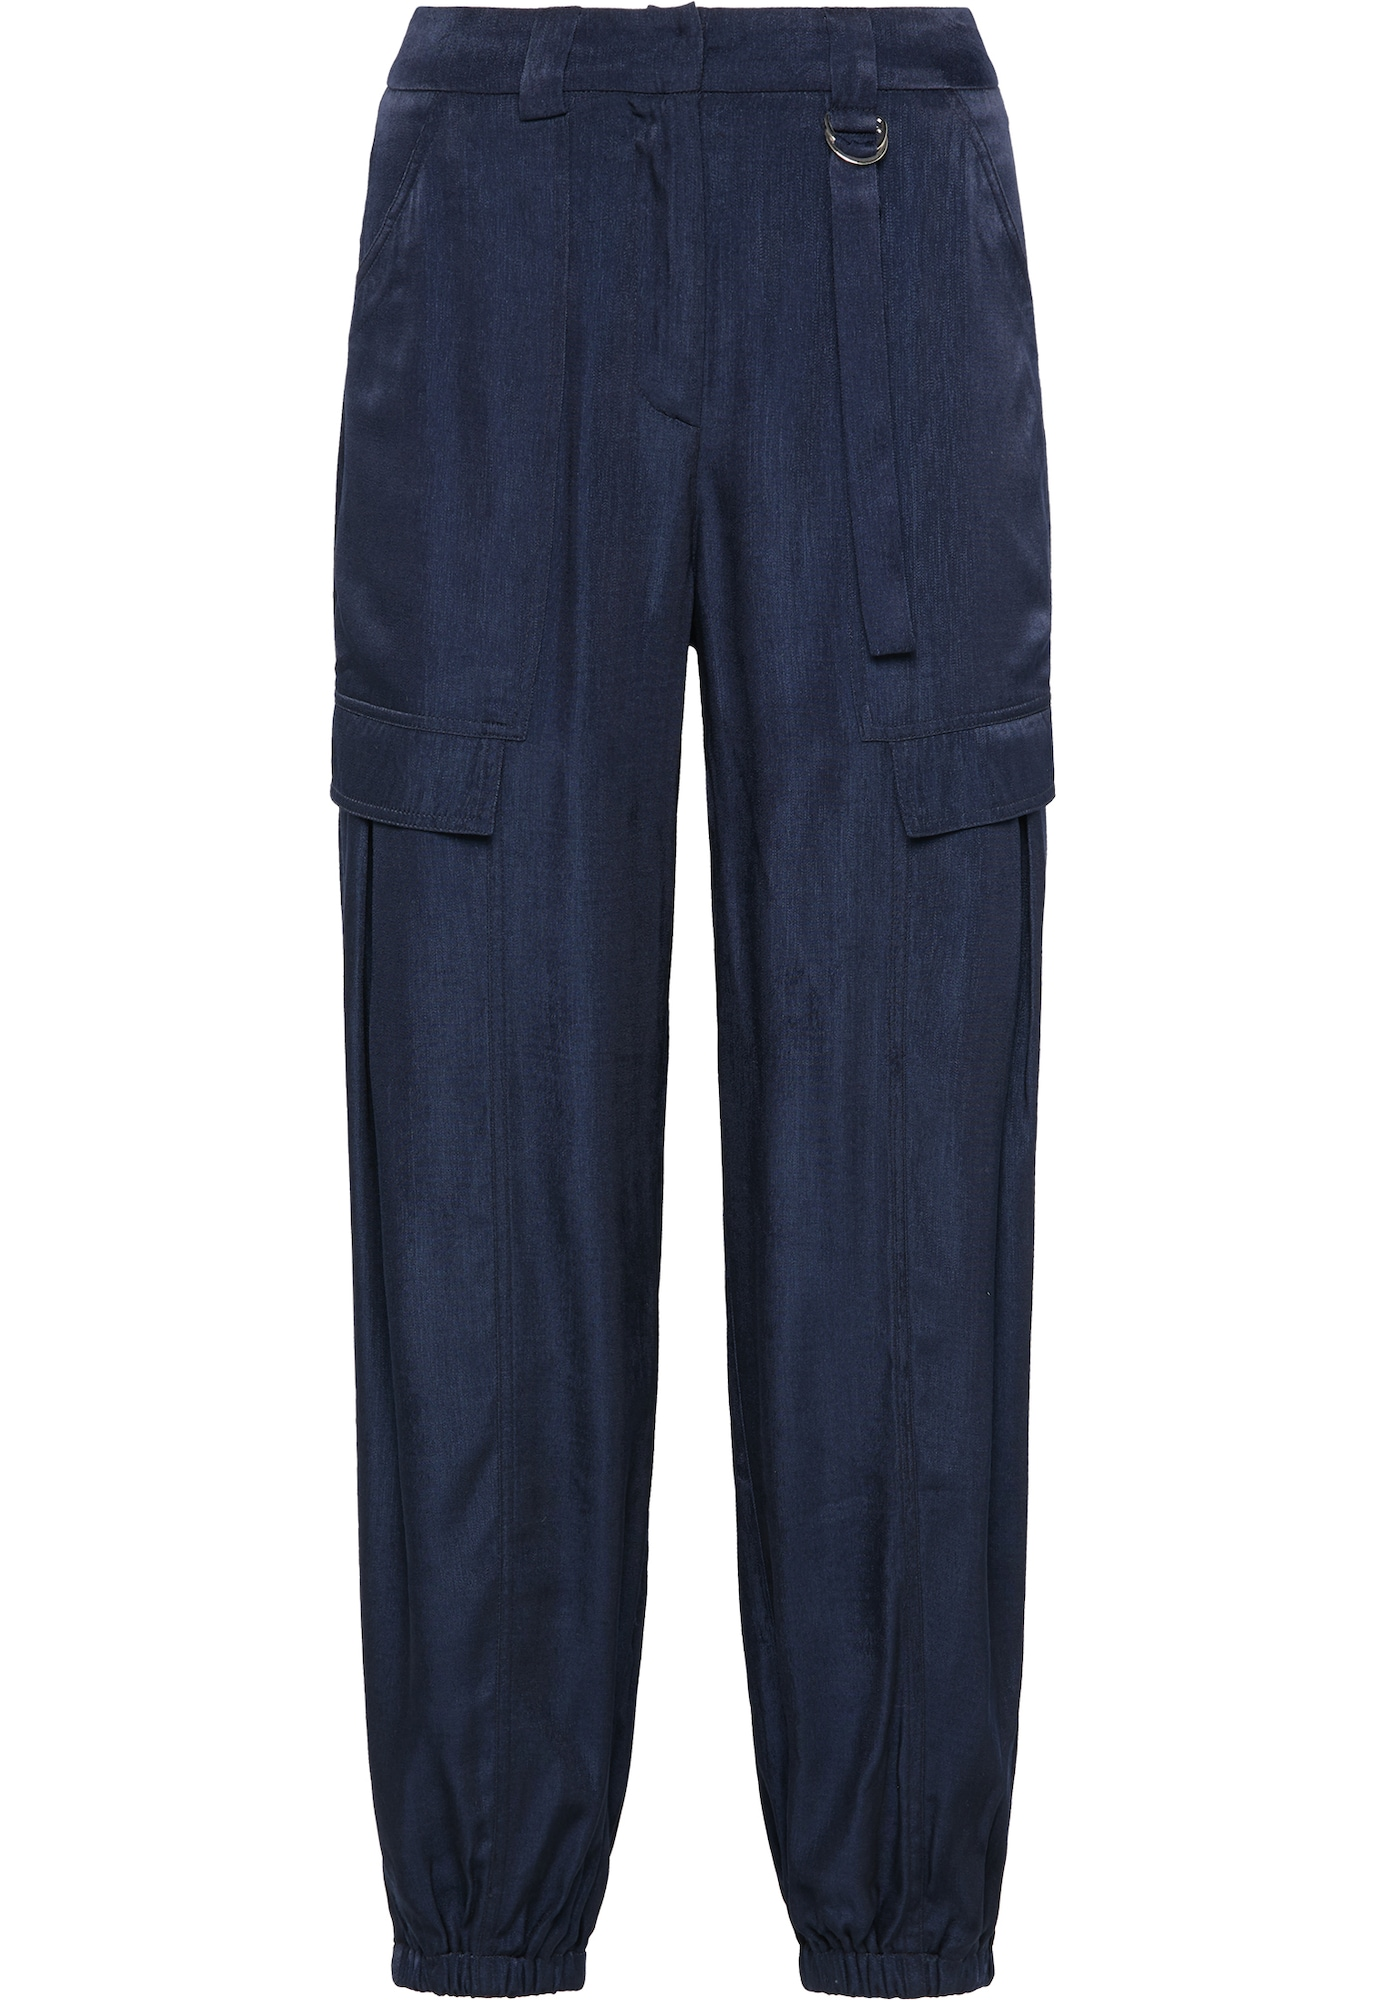 usha BLUE LABEL Laisvo stiliaus kelnės tamsiai mėlyna